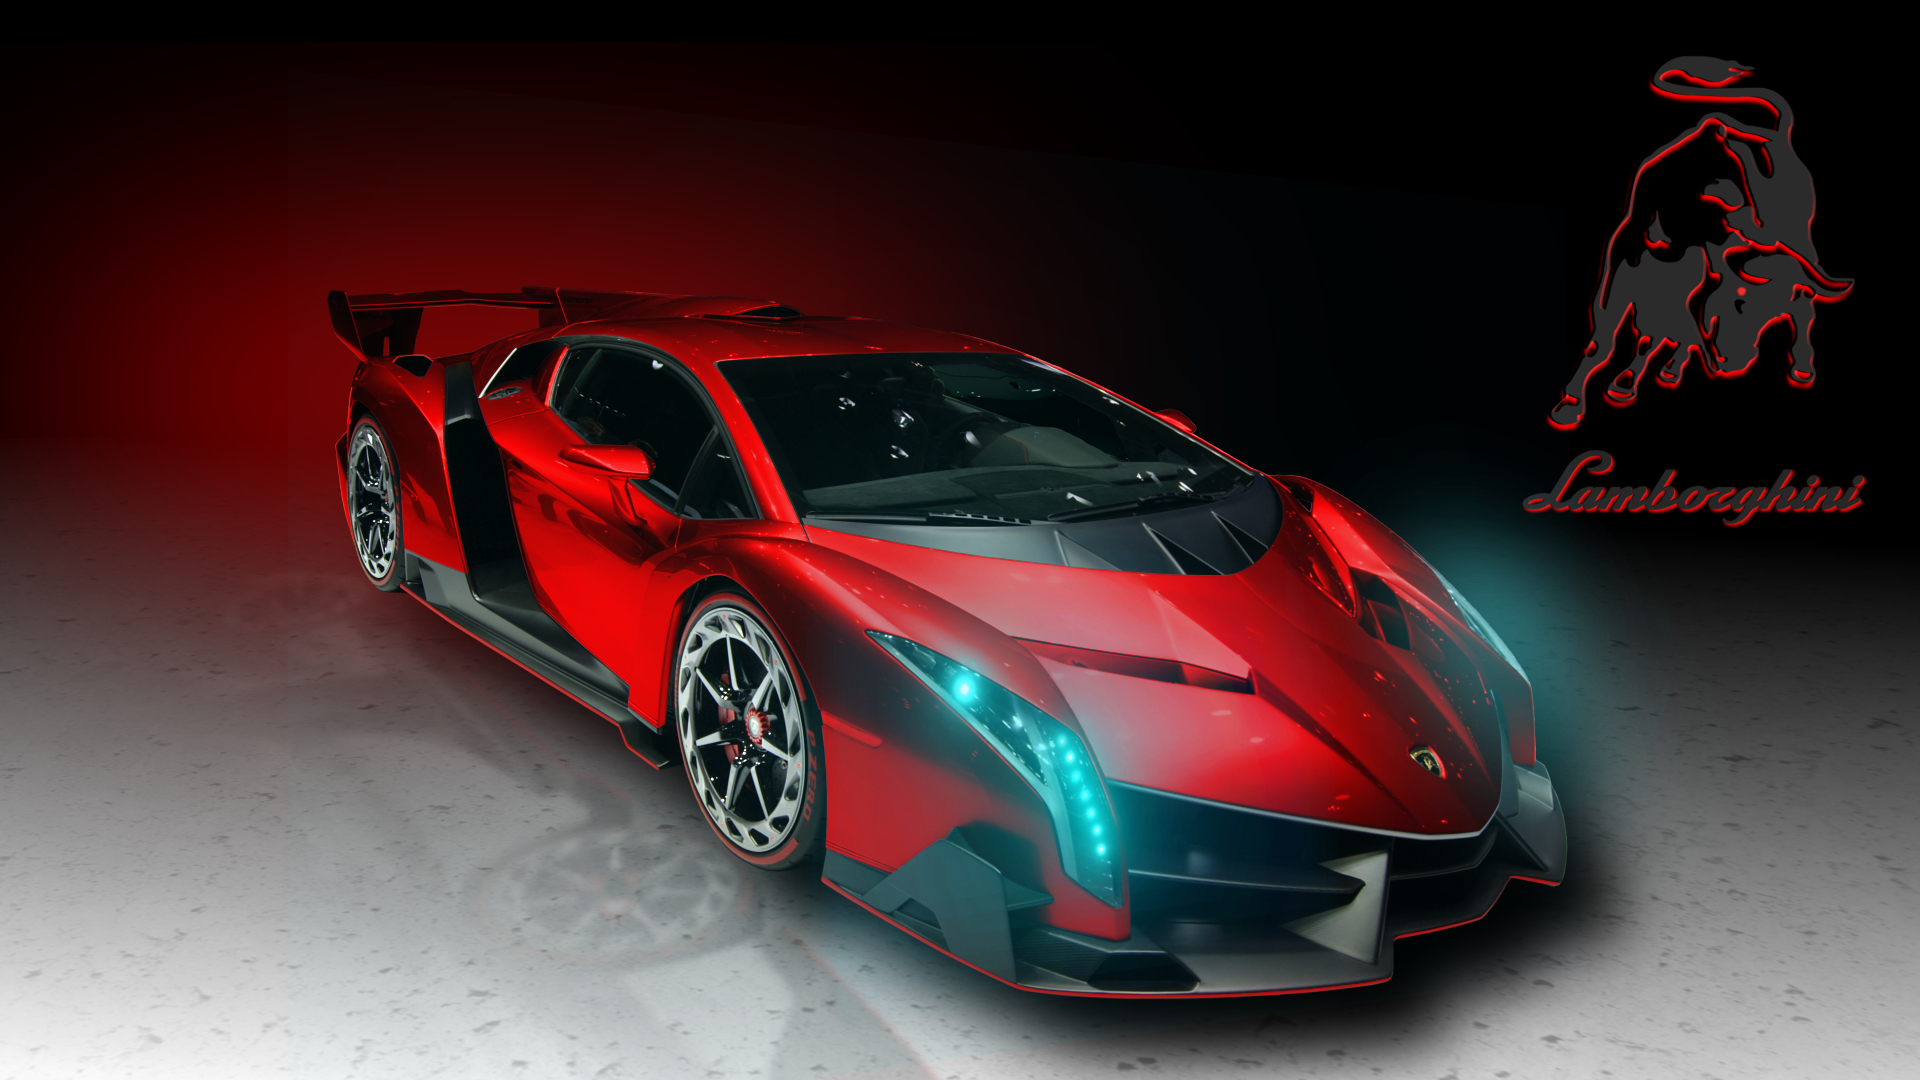 Lamborghini veneno red art exclusive hd wallpapers 4116